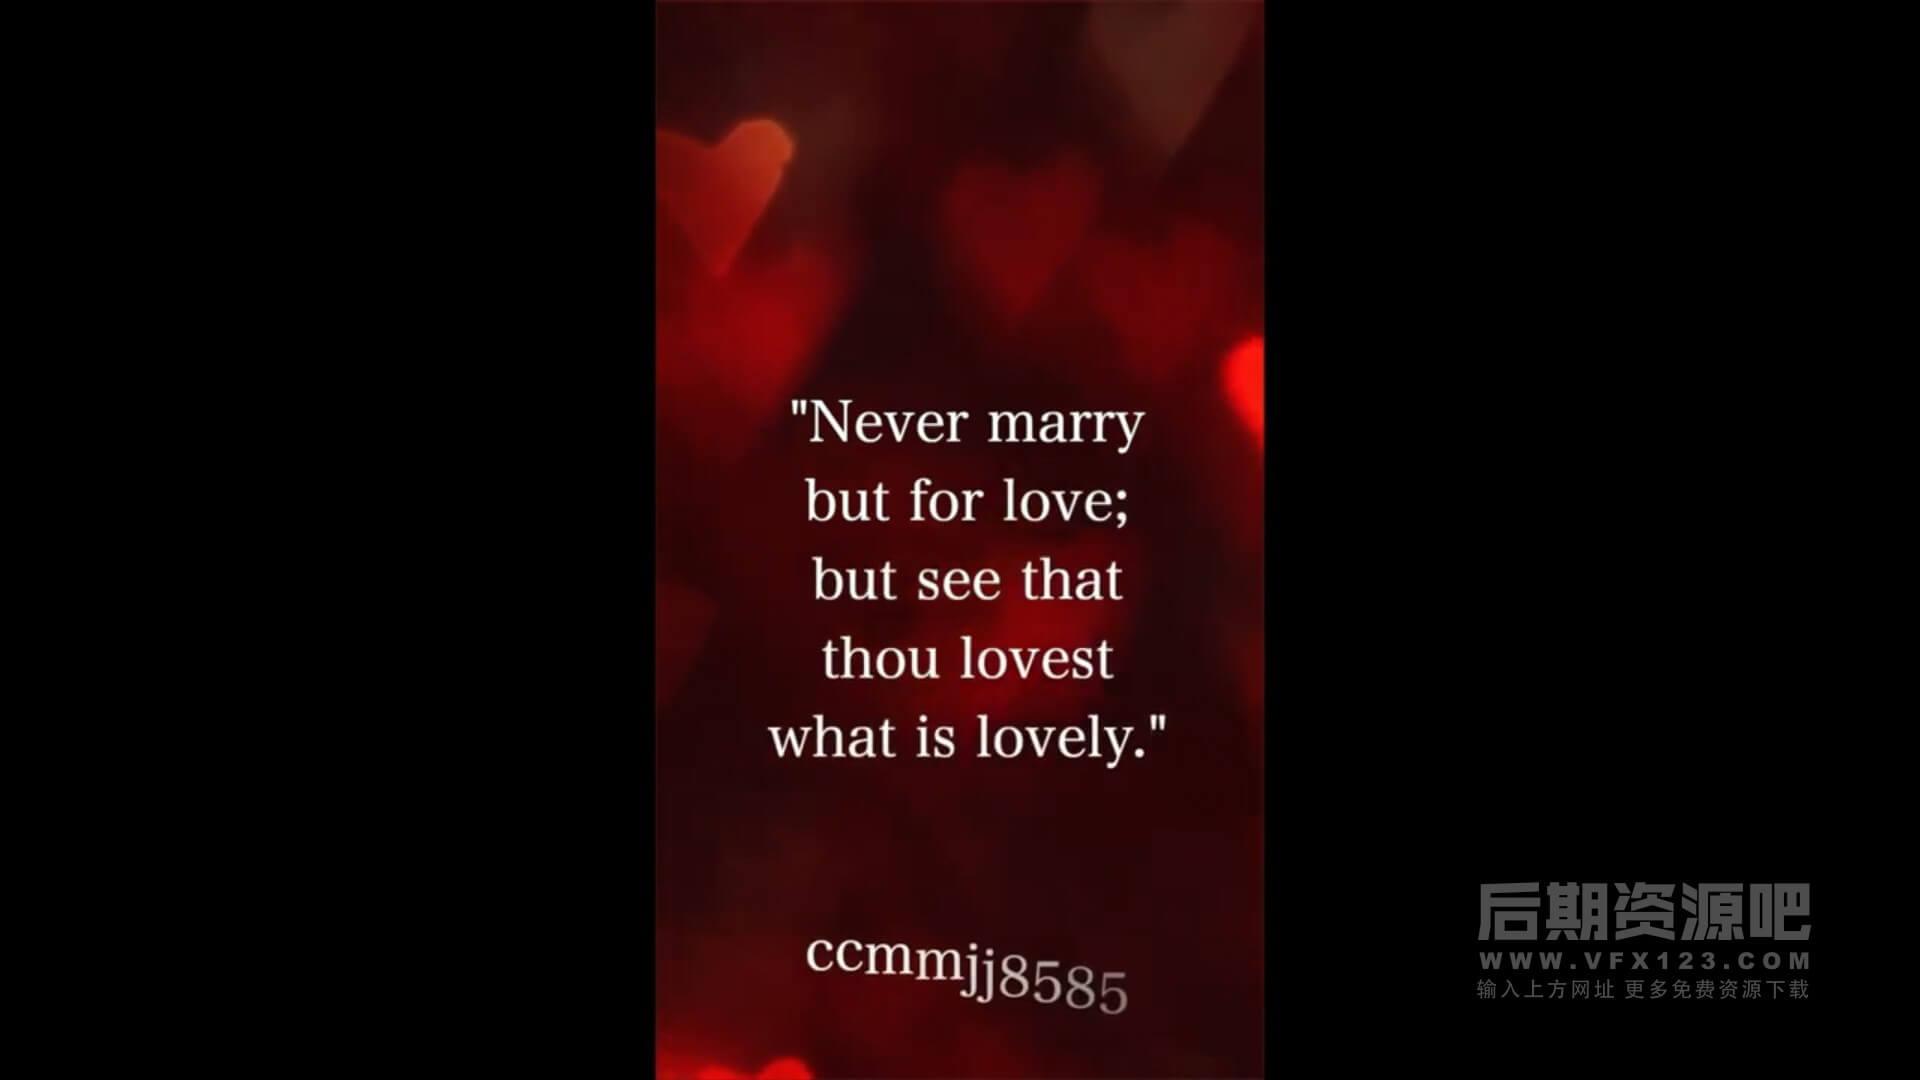 fcpx竖屏模板 婚礼爱情浪漫适用手机短视频 Love Story